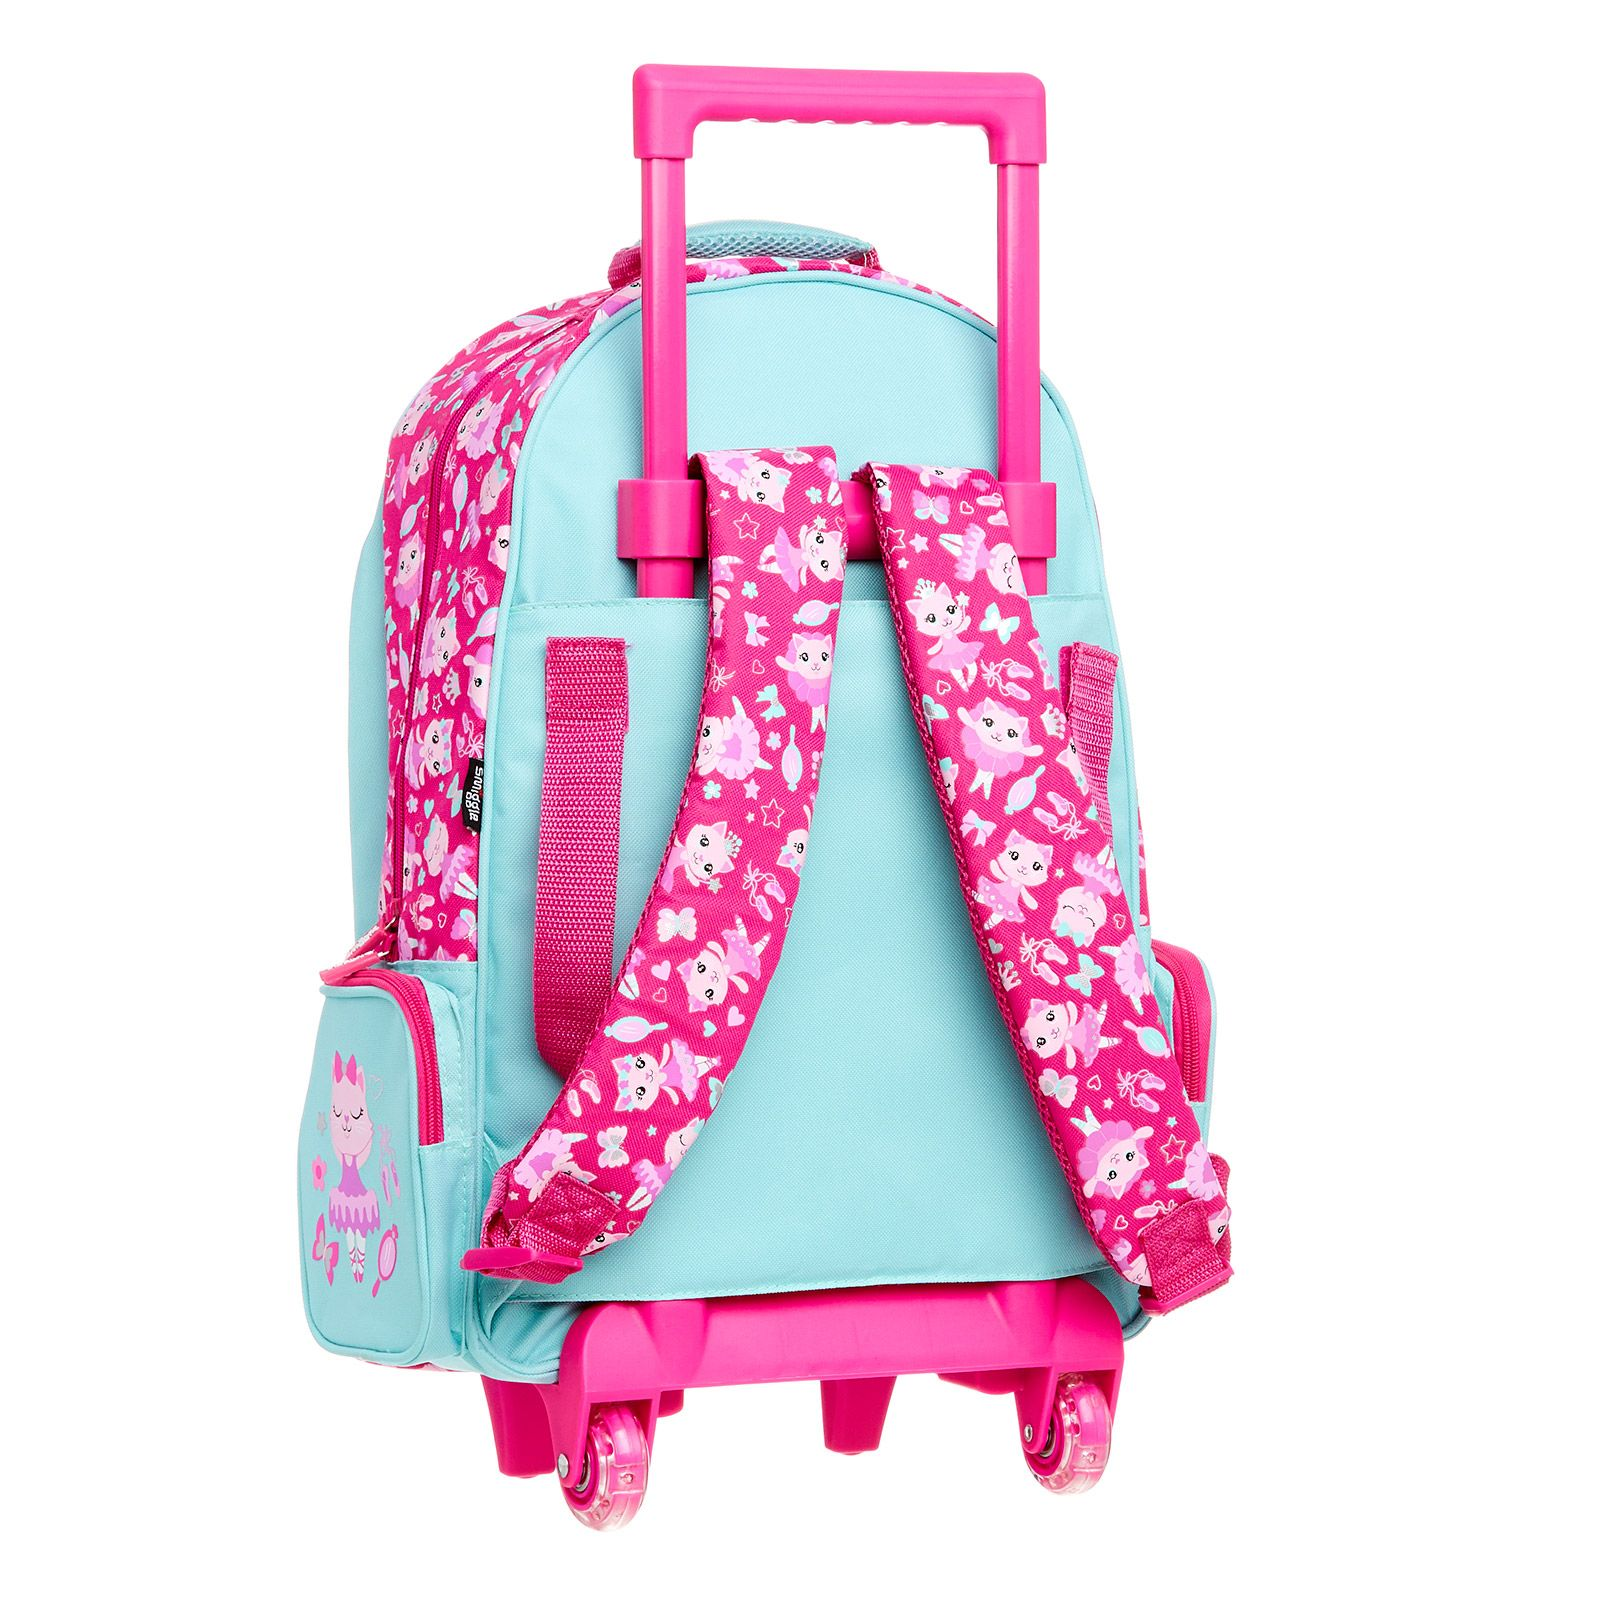 Swish Light Up Trolley Bag Smiggle School Bags For Kids Bags Australia School Bags